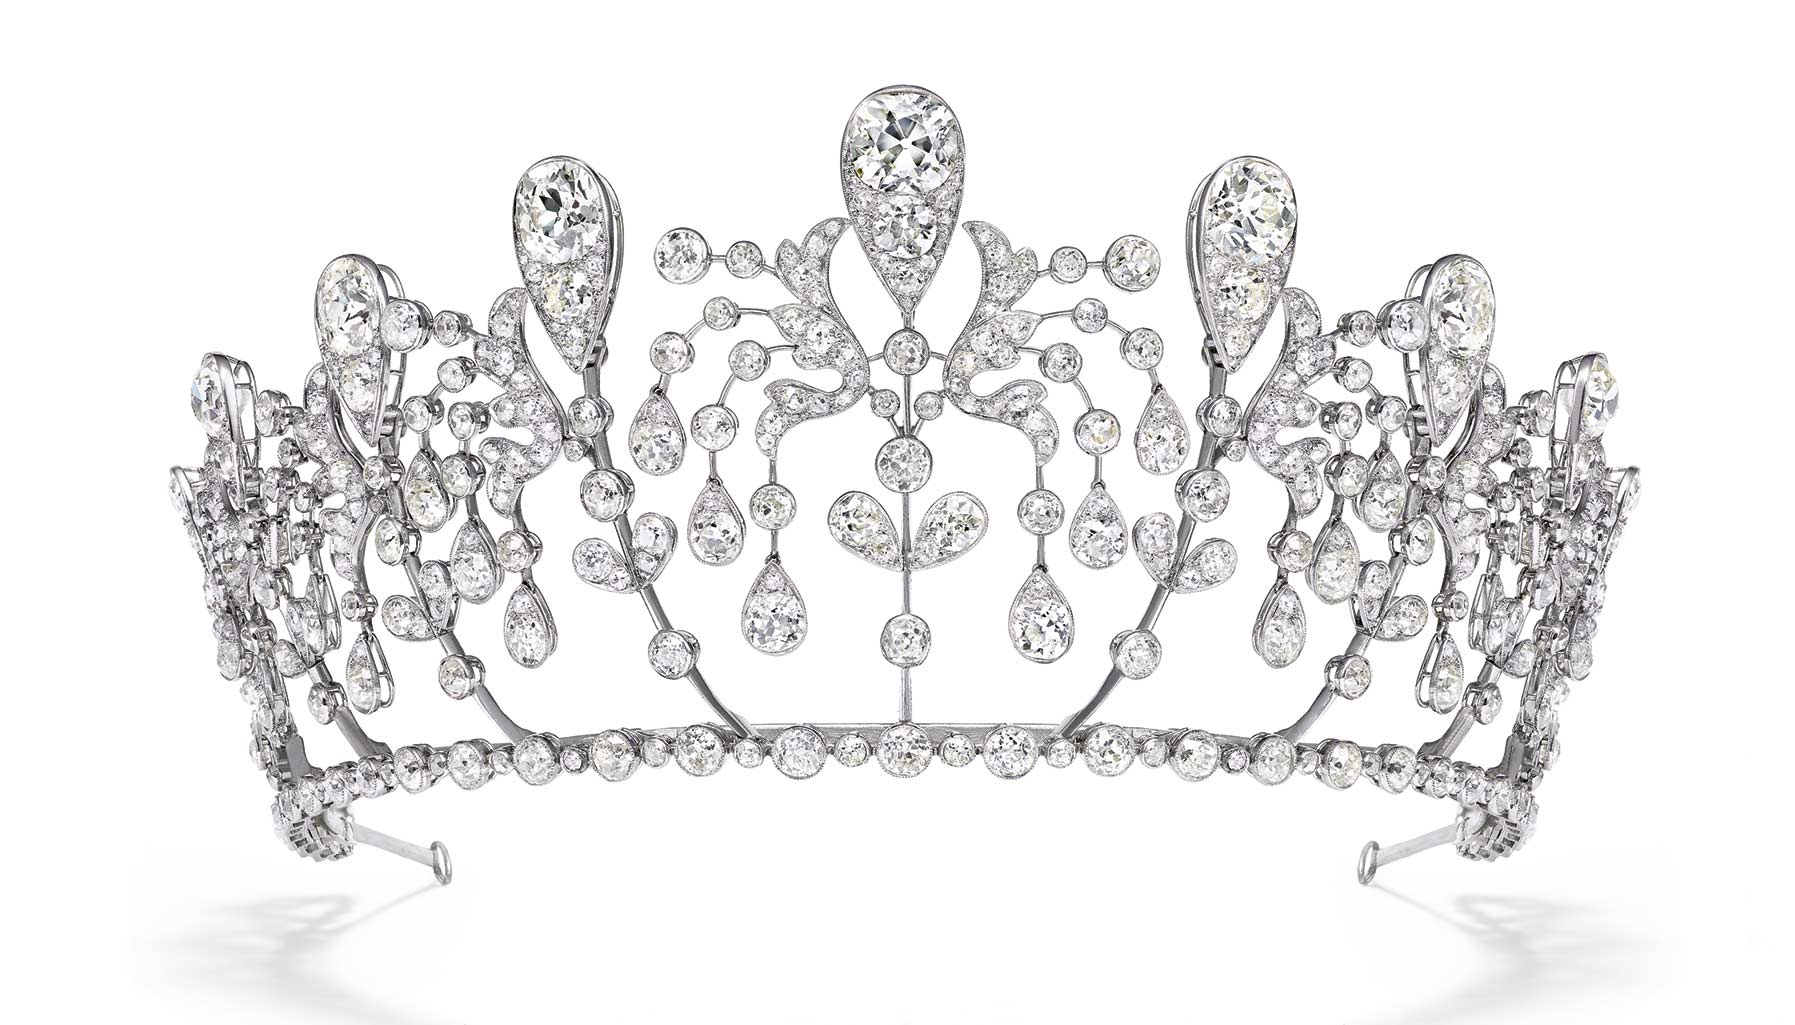 Chaumet Bourbon-Parma tiara, at Beijing's Forbidden City